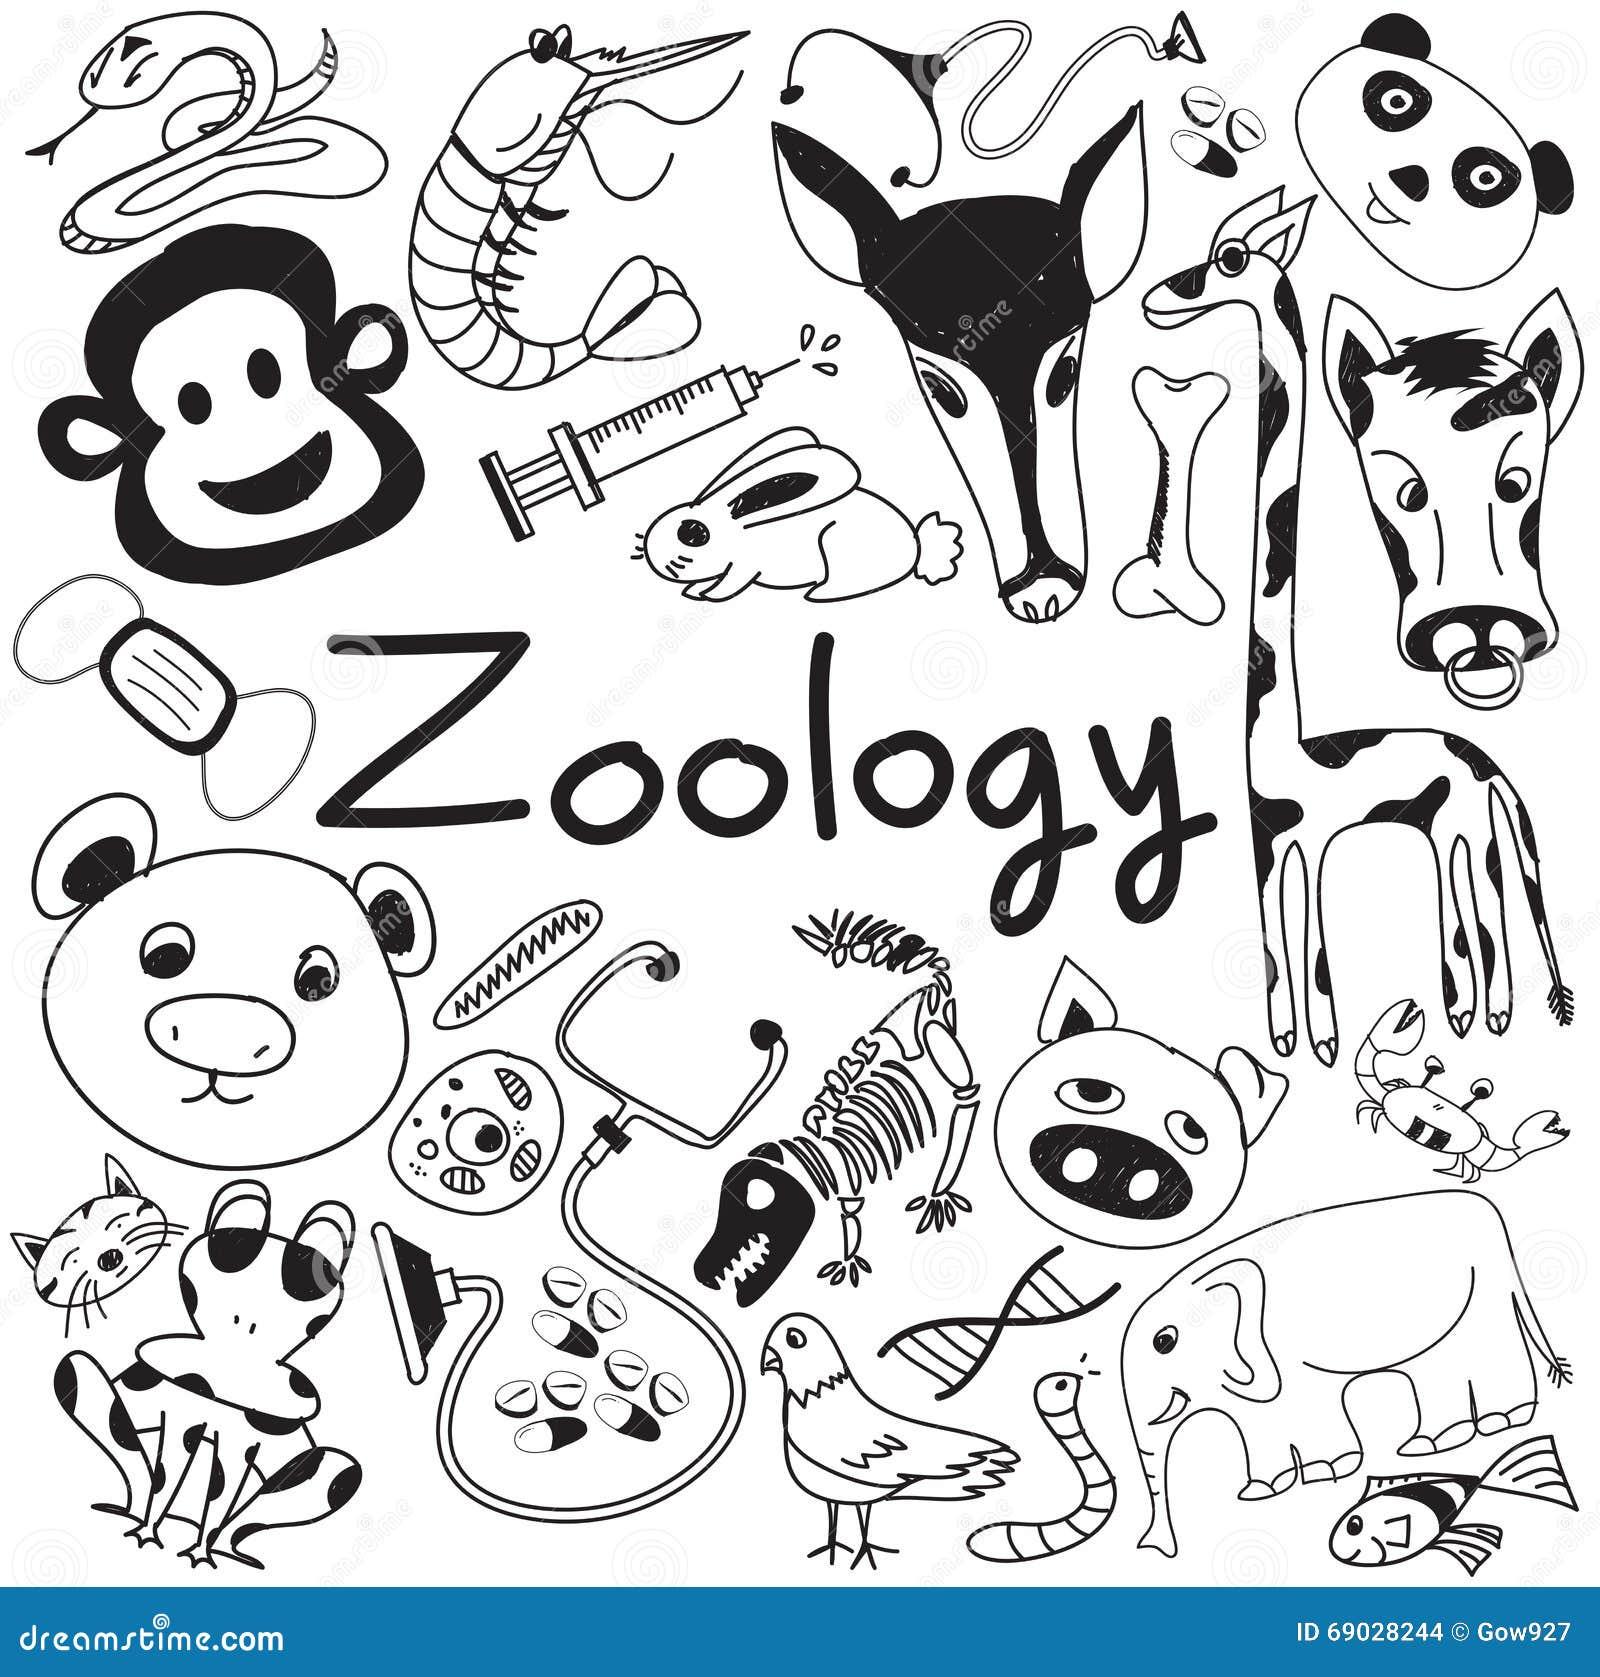 Zoologist Stock Illustrations – 46 Zoologist Stock Illustrations ...